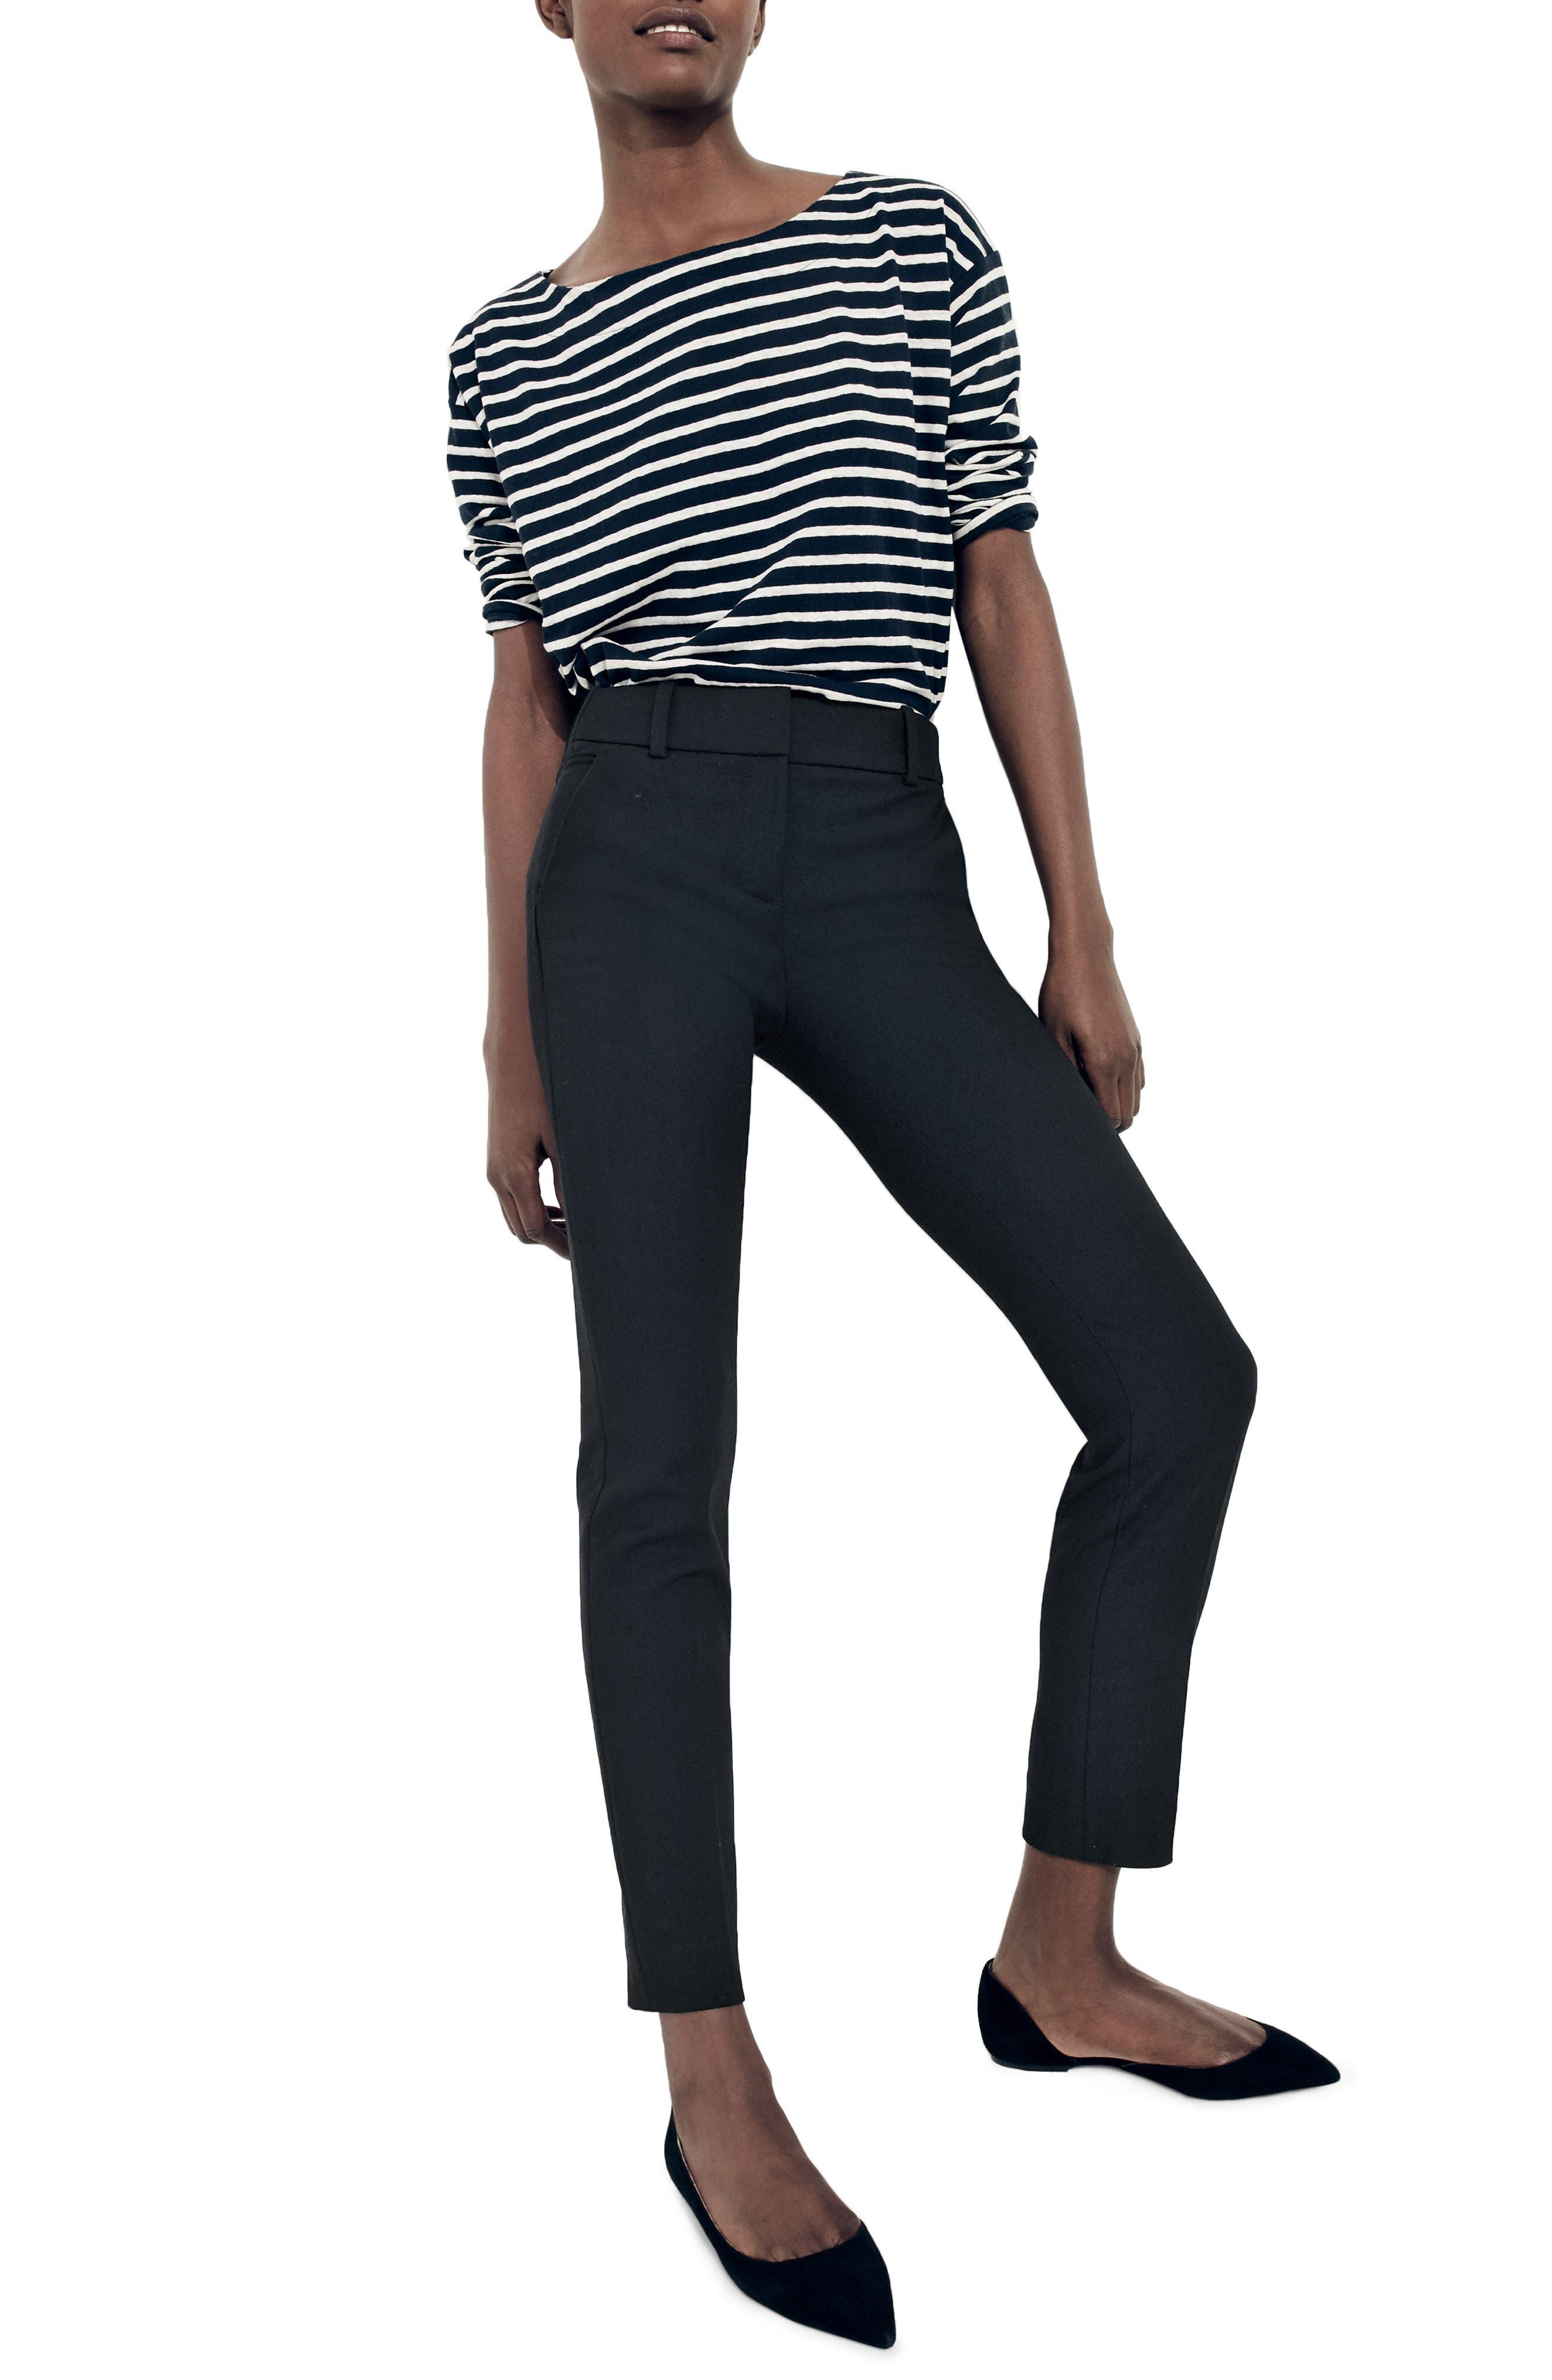 Cameron Four Season Crop Pants,                         Main,                         color, Black